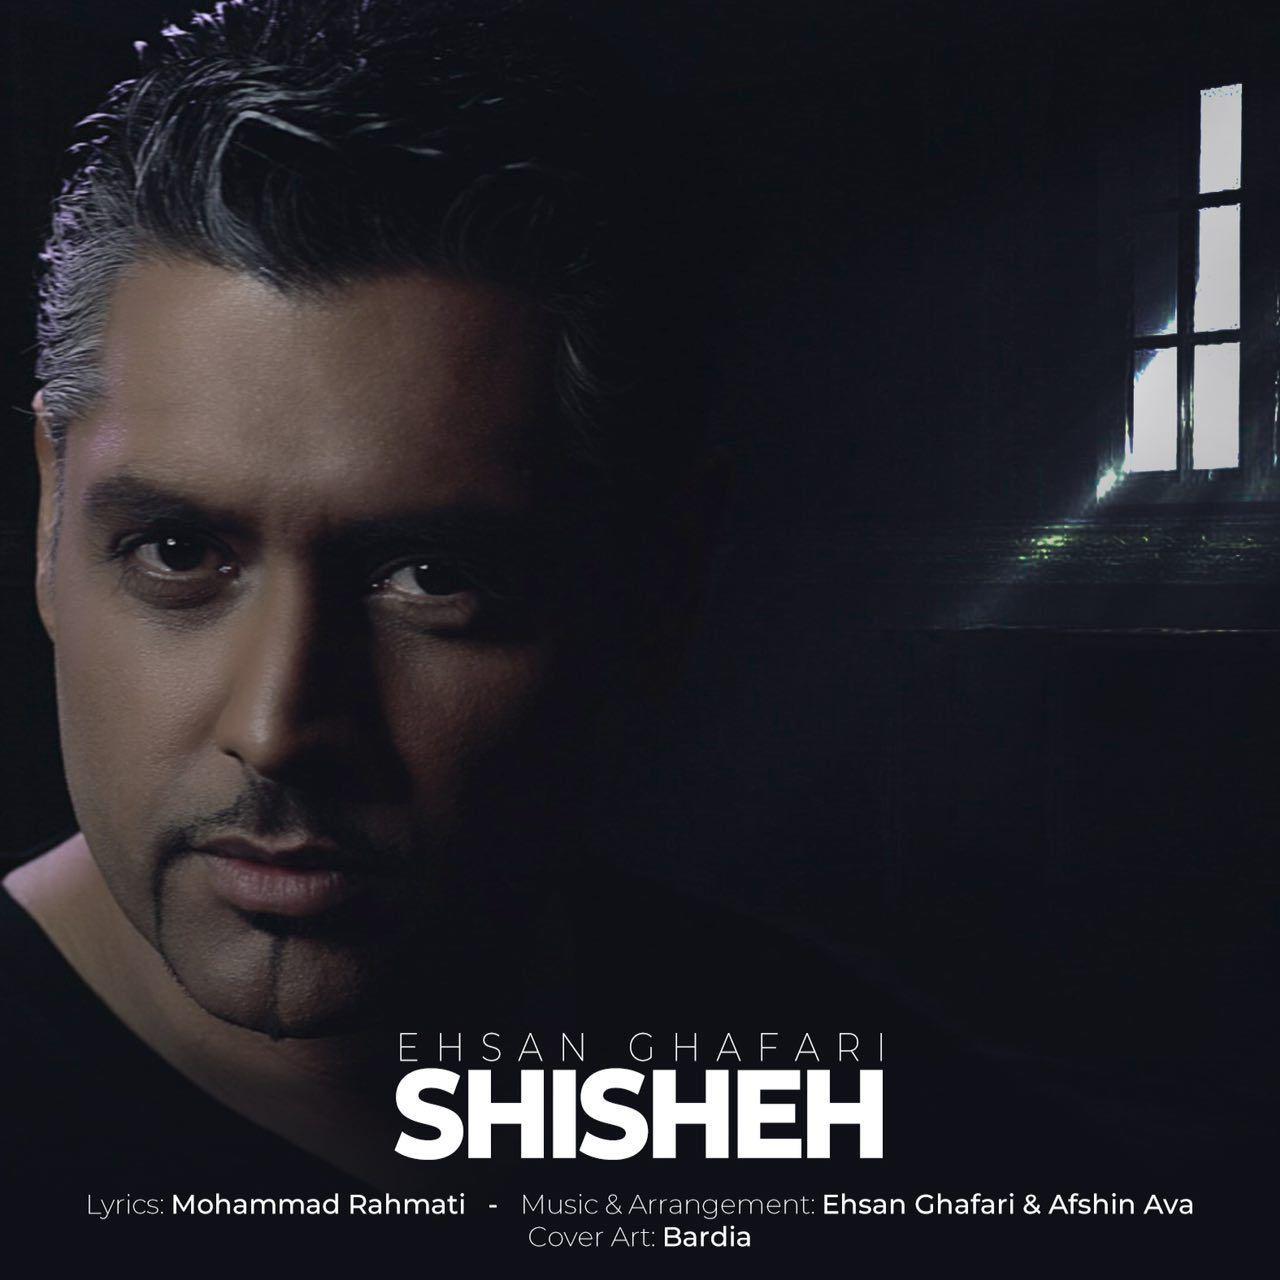 Ehsan Ghafari – Shishe